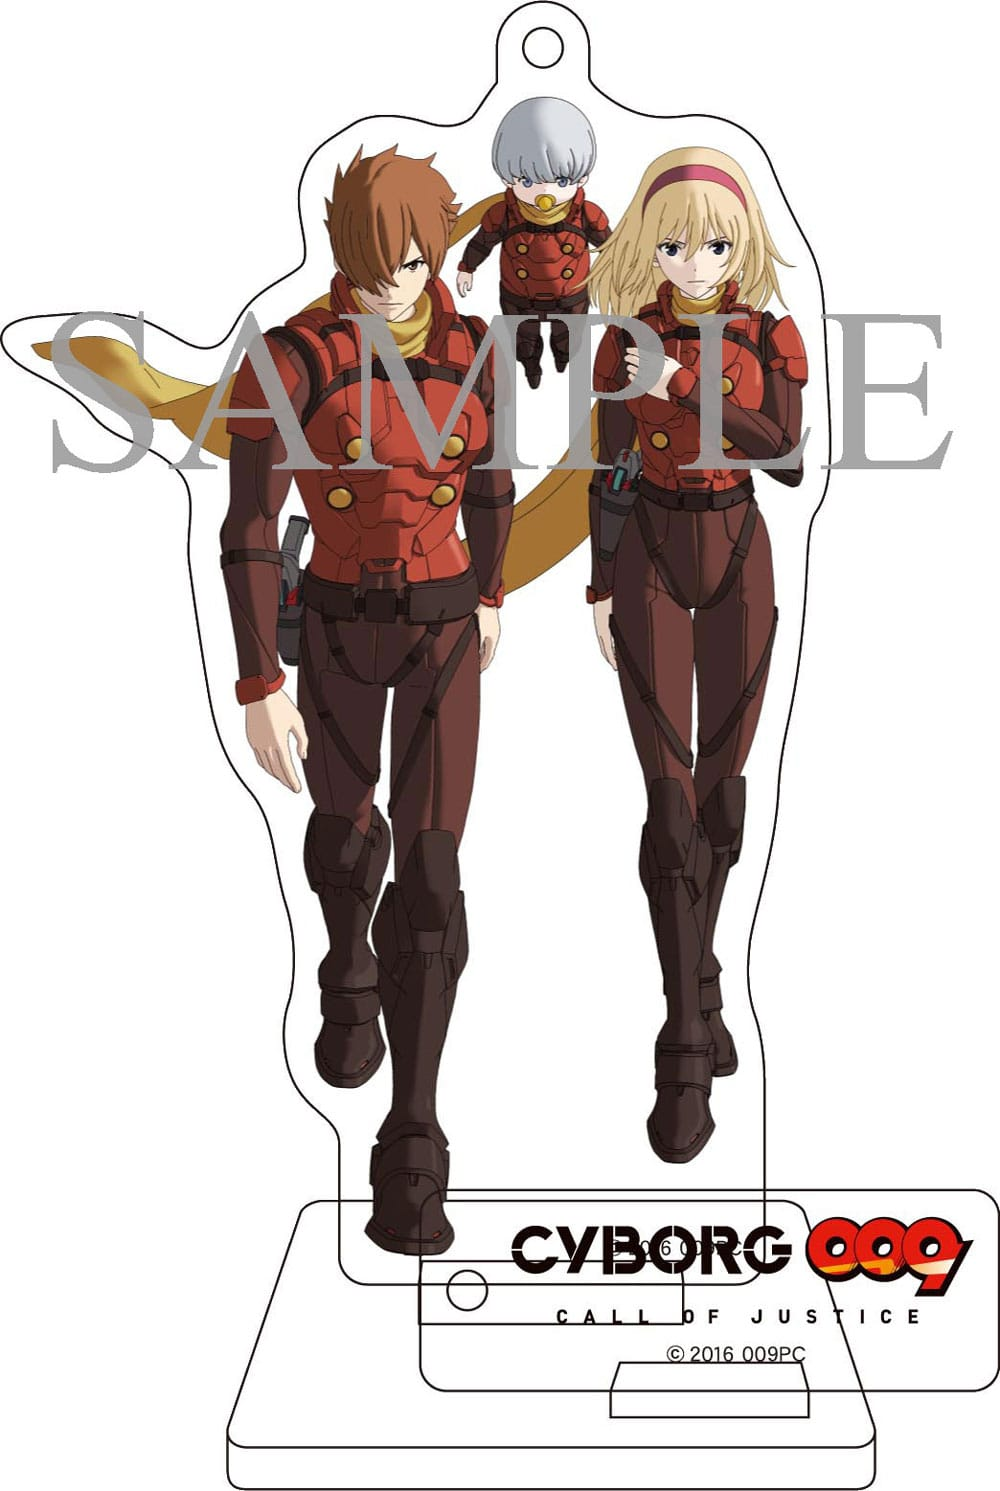 【TOHO animation STORE 限定版】CYBORG009 CALL OF JUSTICE Vol.1 DVD 初回生産限定版+オリジナルアクリルスタンディセット